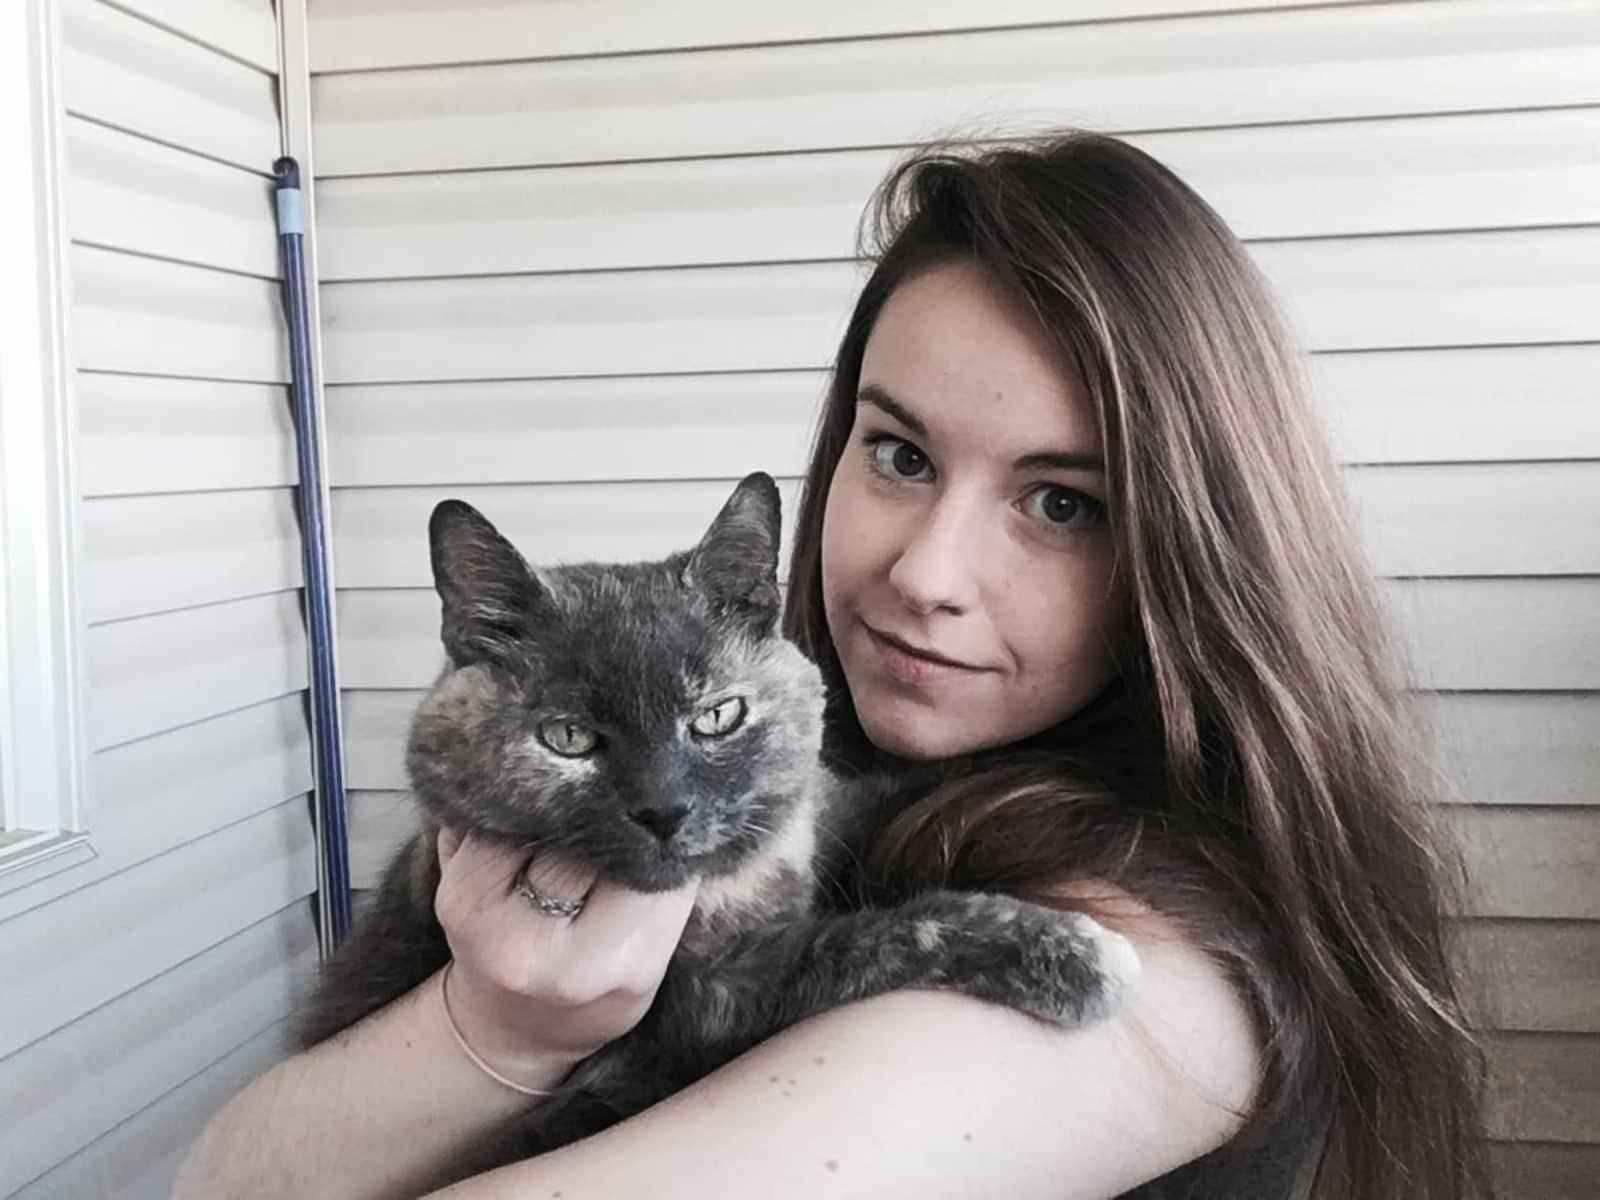 Miranda from New Orleans, Louisiana, United States